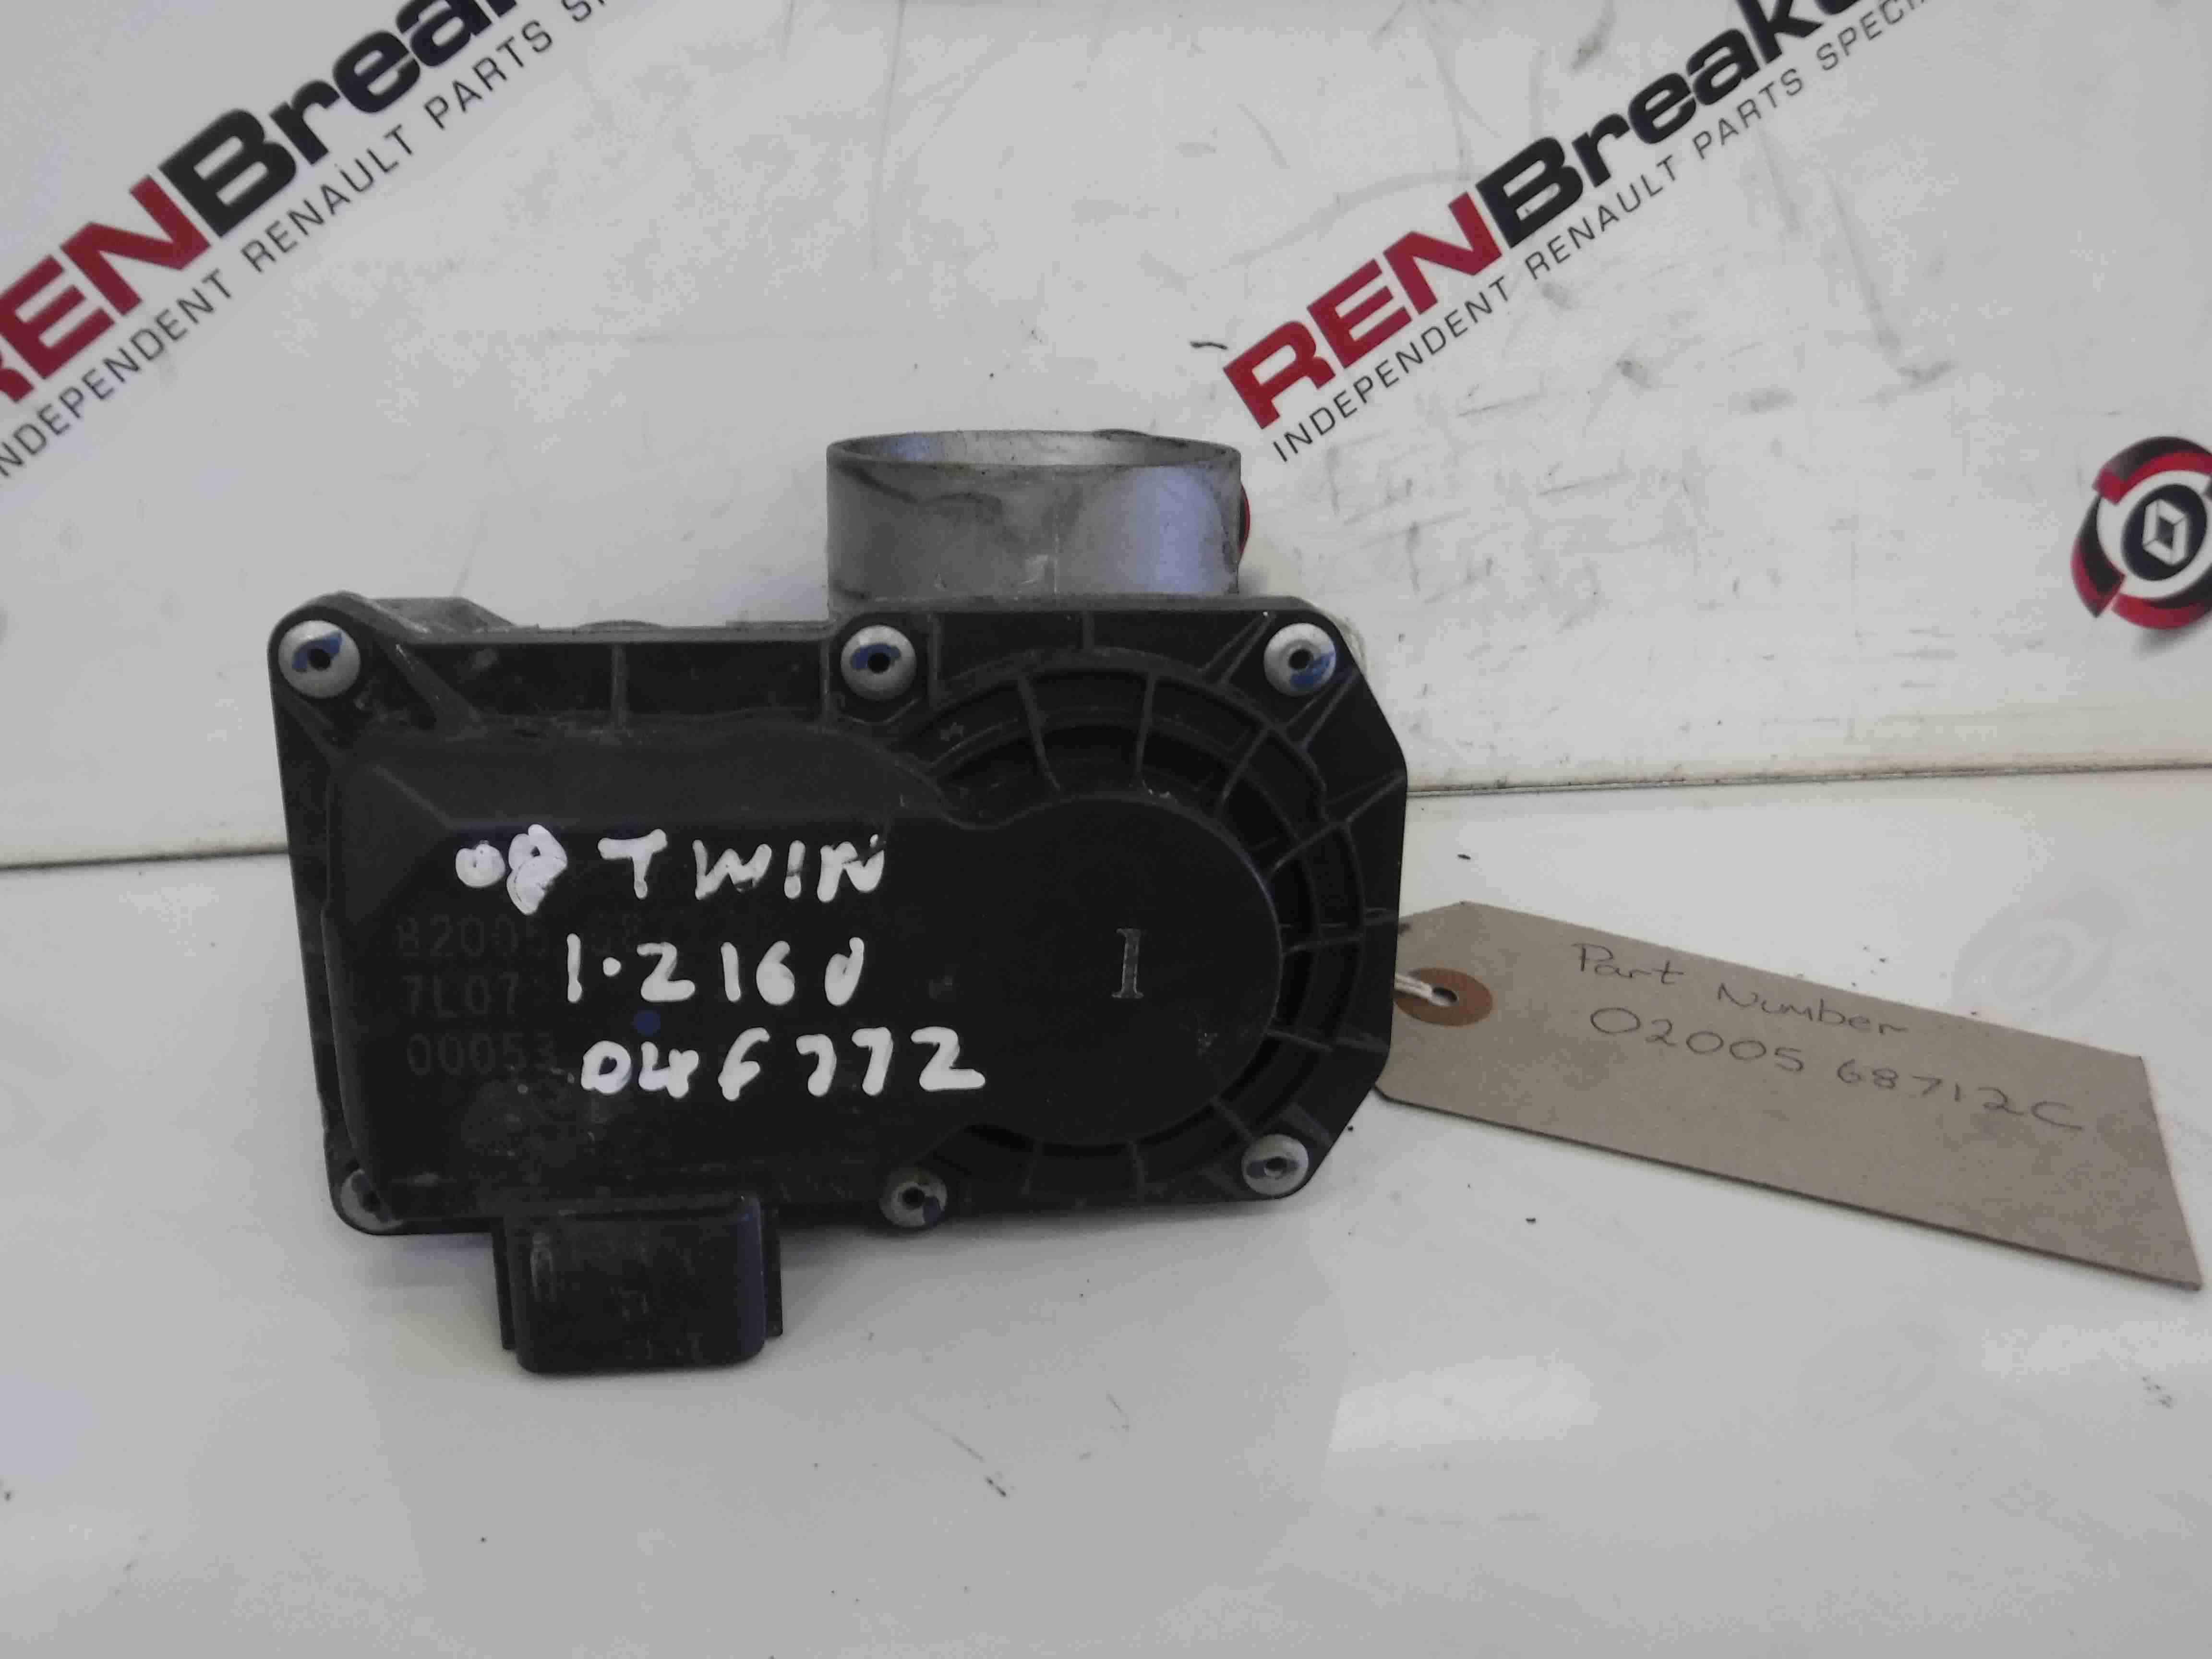 Renault Twingo 2007-2011 16v Throttle Body 8200568712 D4F 772 1.2